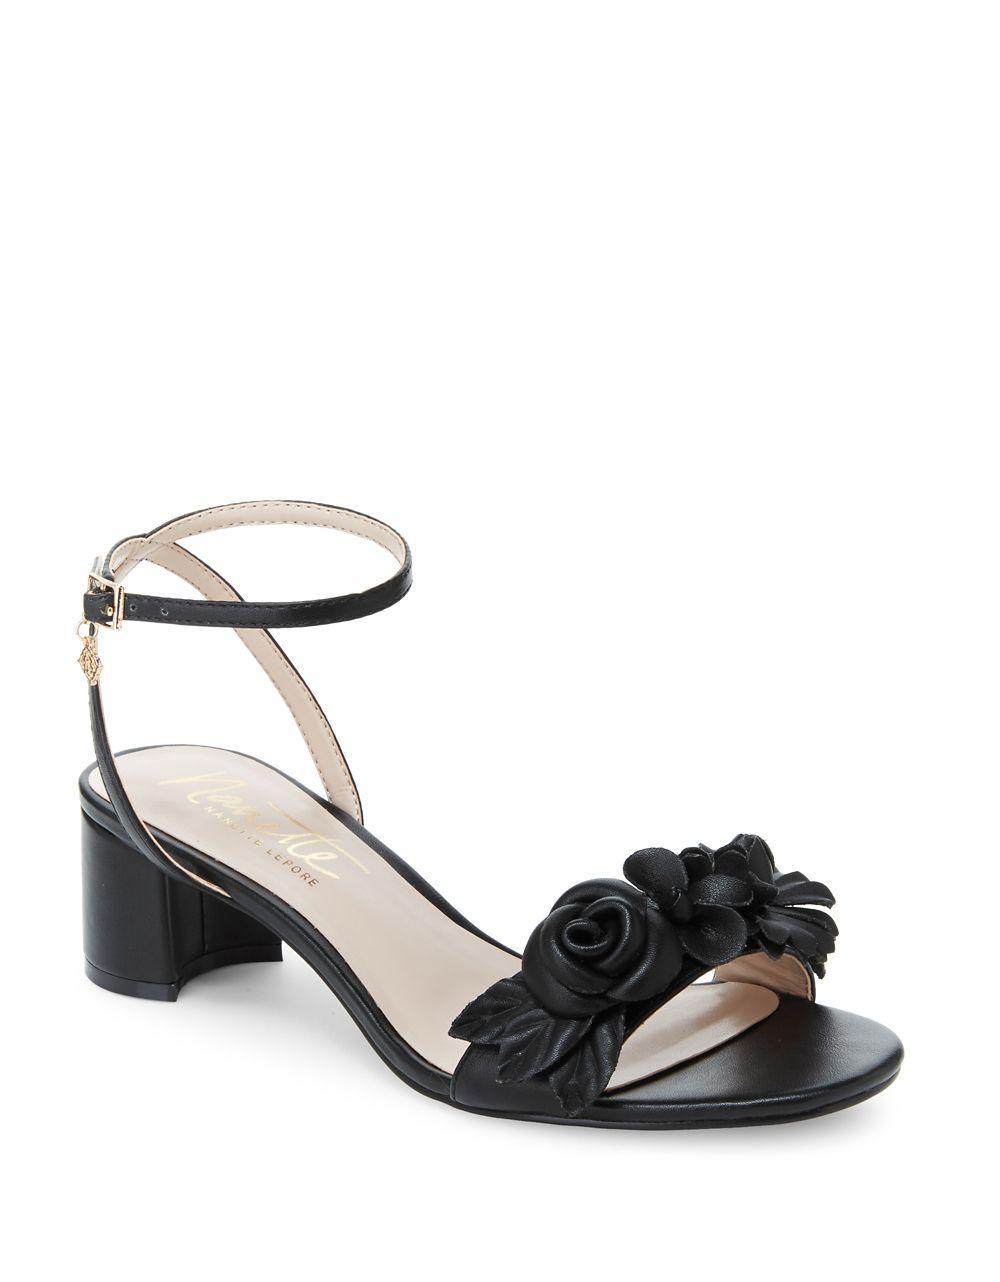 NANETTE nanette lepore Donna Ankle Strap Heeled Sandal bj2l2